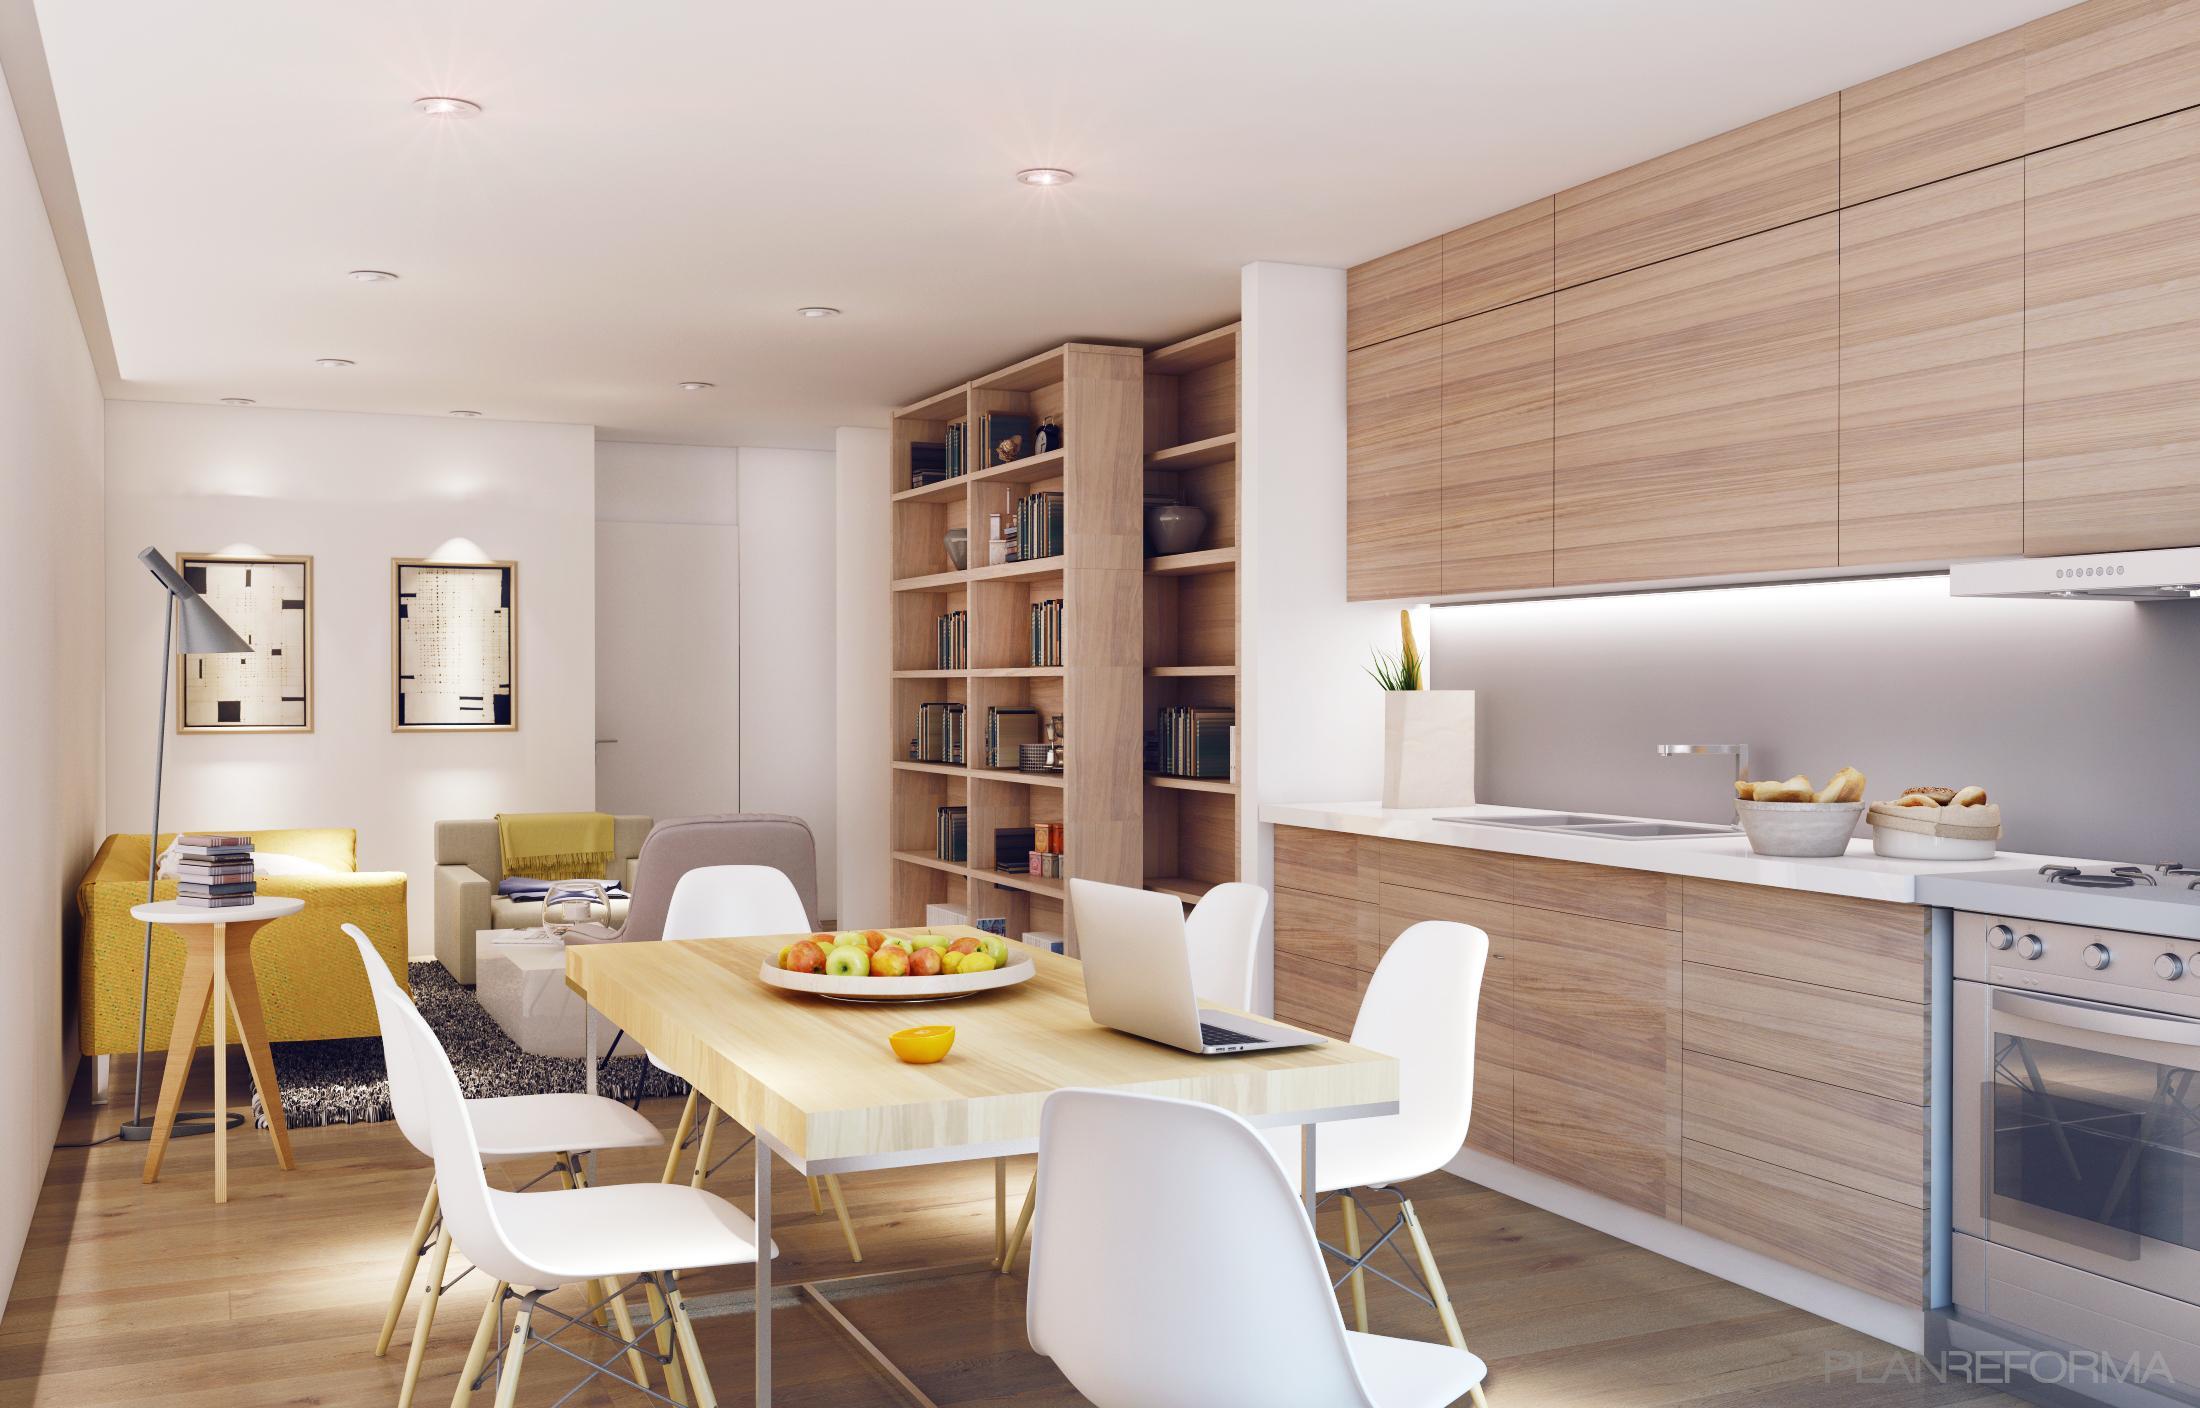 Comedor cocina salon style moderno color amarillo for Cocinas modernas en gris y blanco